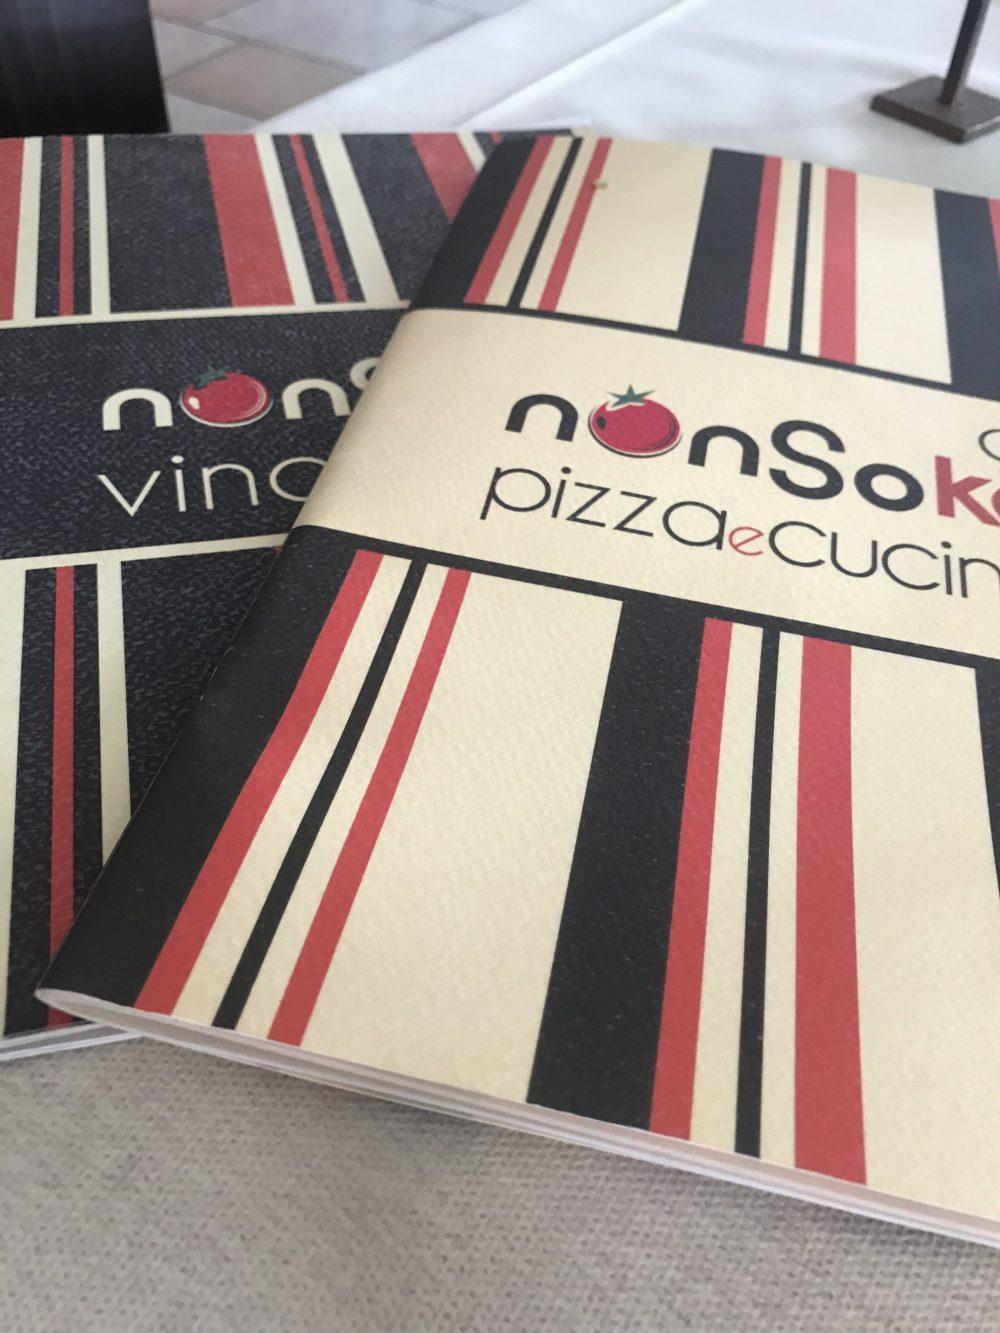 NonSoKe Pizza e Cucina - Menu'